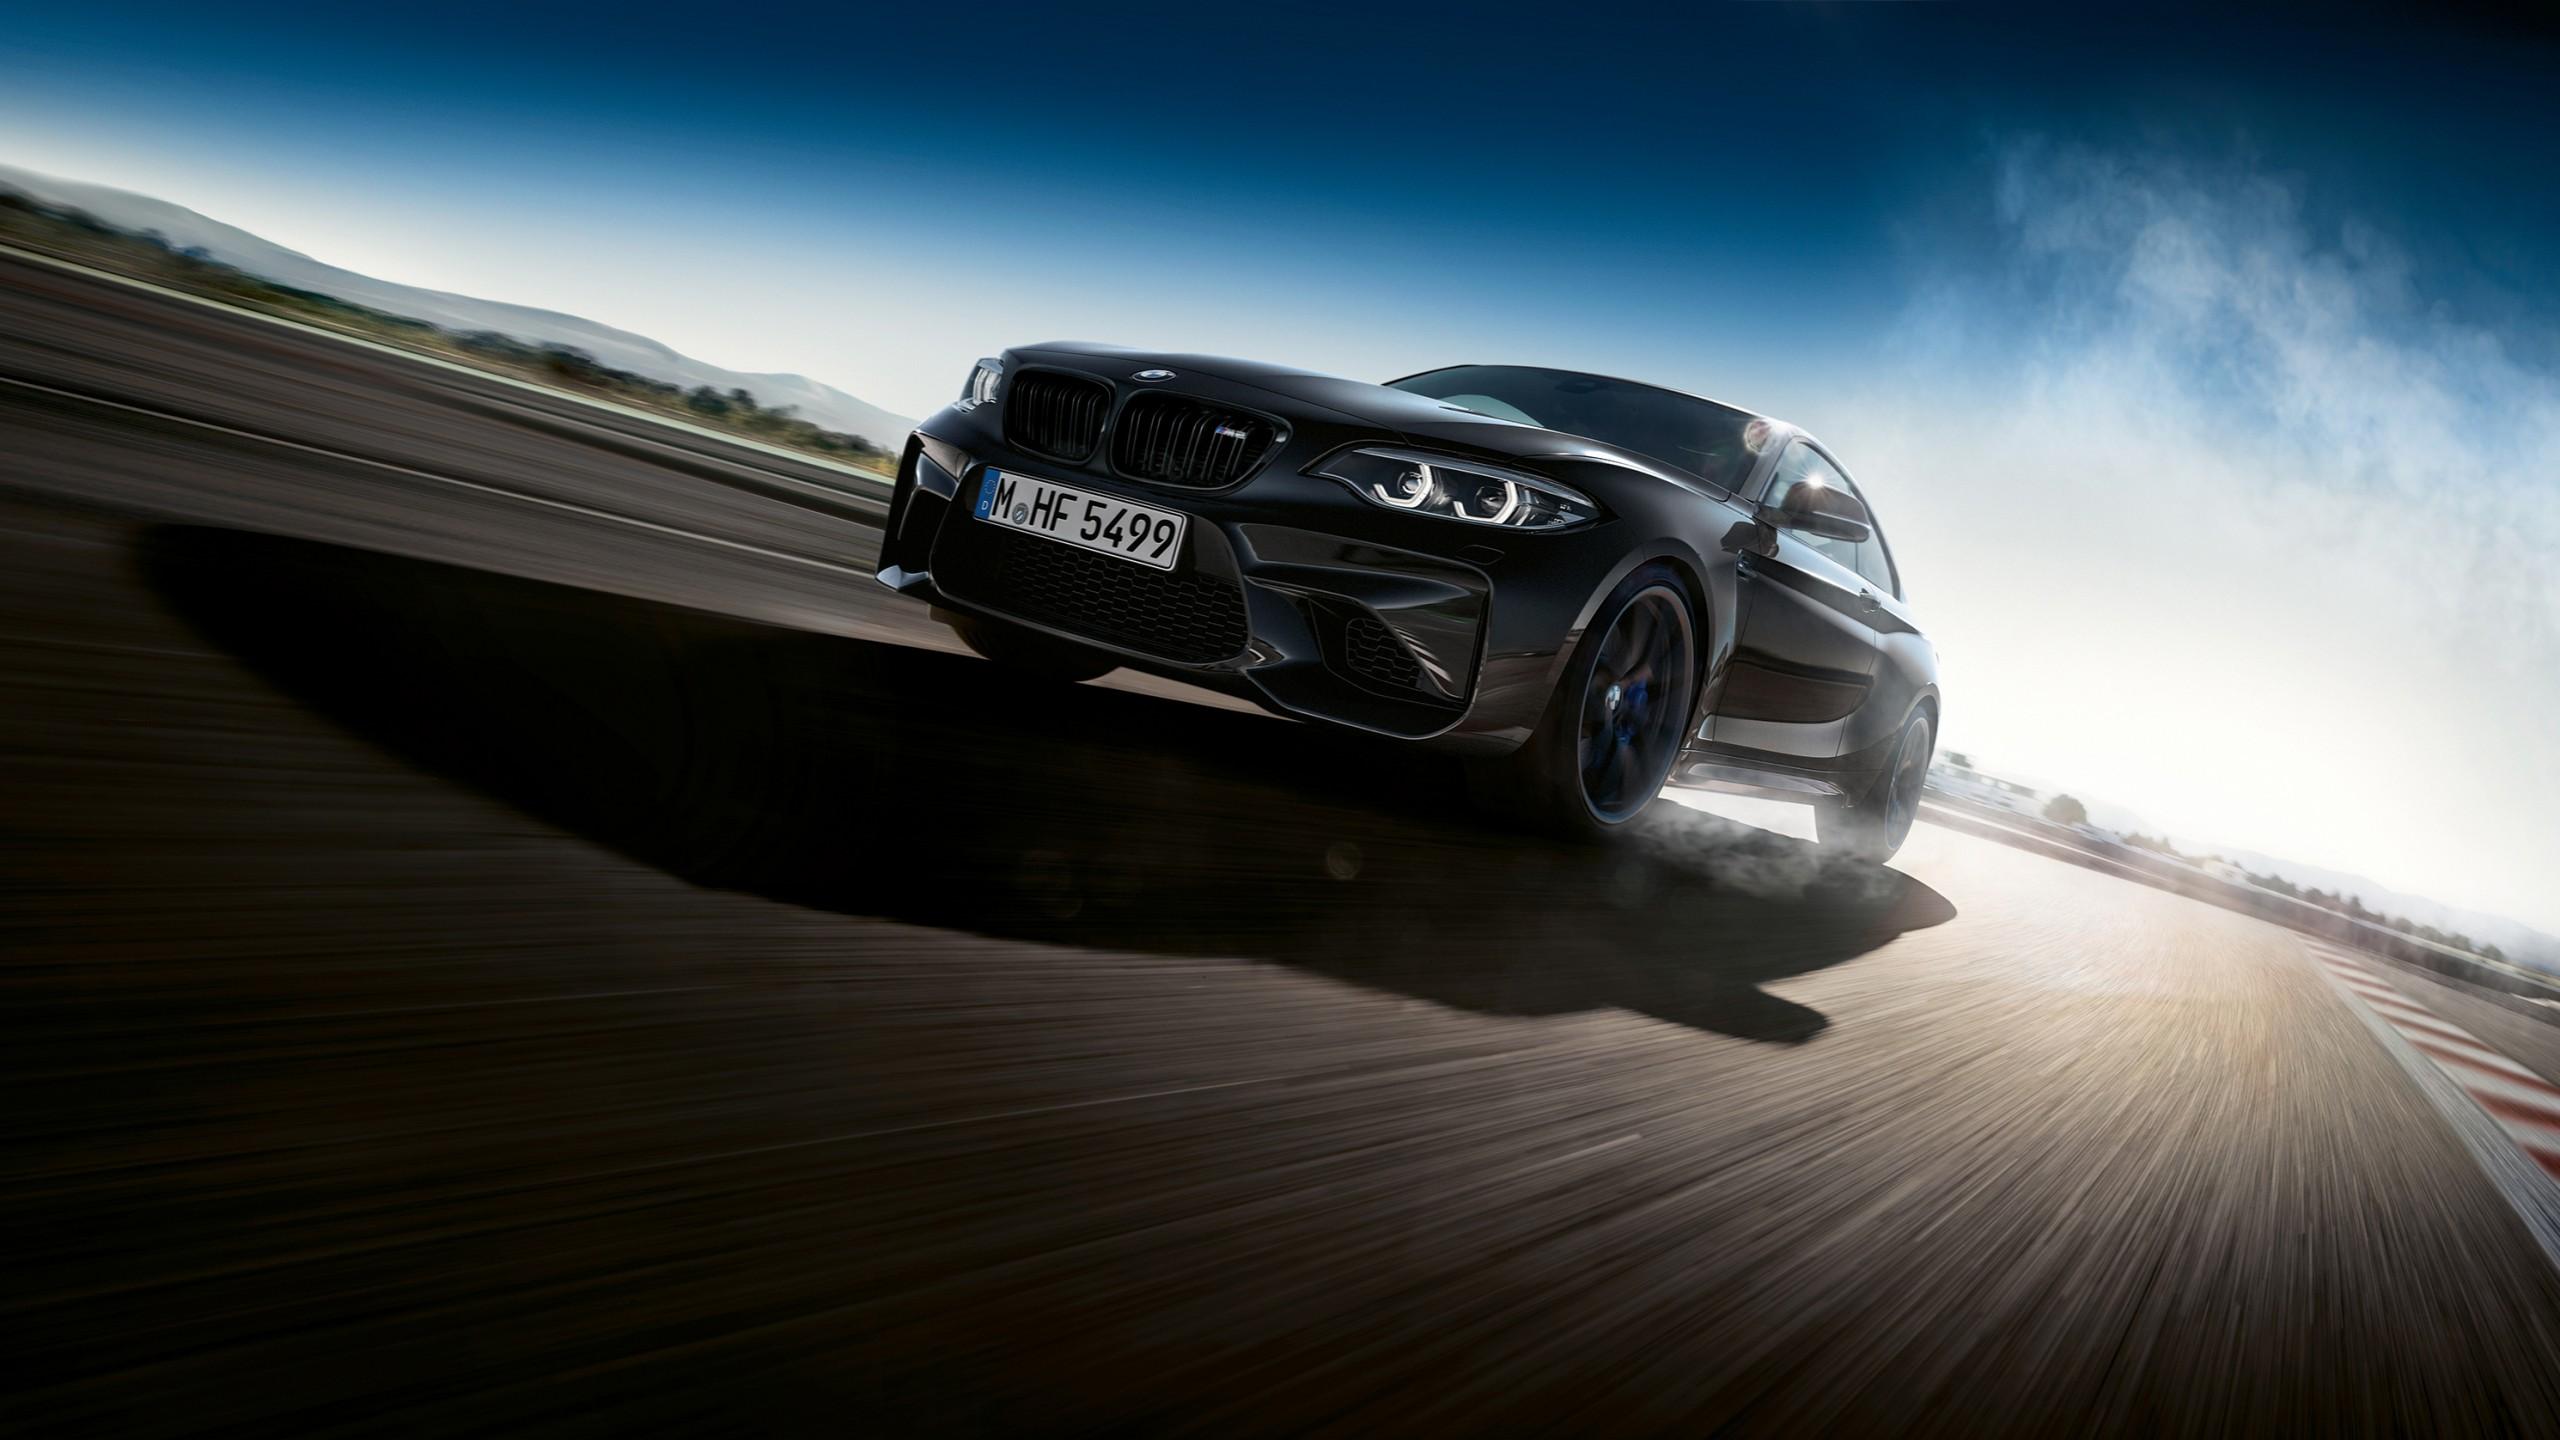 2018 Bmw M2 Coupe Edition Black Shadow Wallpaper Hd Car